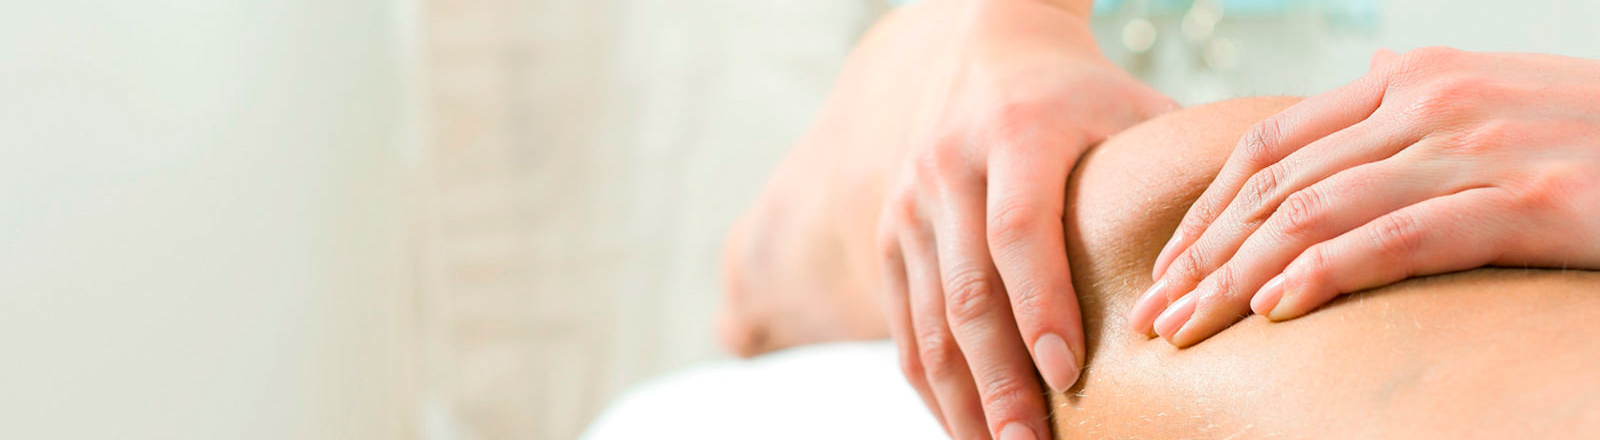 drenaje post mastectomia Logroño